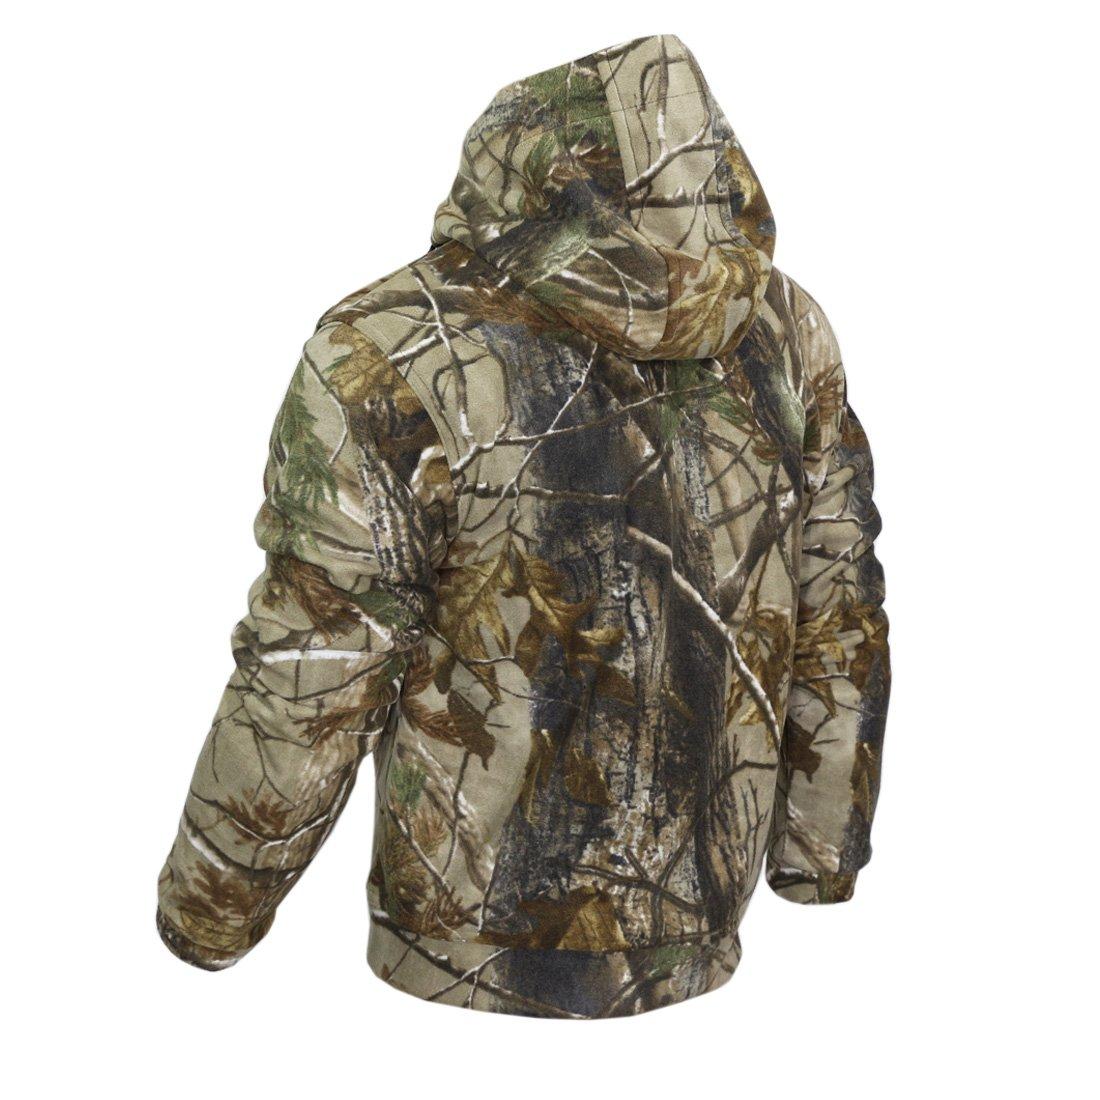 ac485380003e8 Lightweight Three-Layers Waterproof Hunting Jacket Realtree AP:  Amazon.co.uk: Clothing